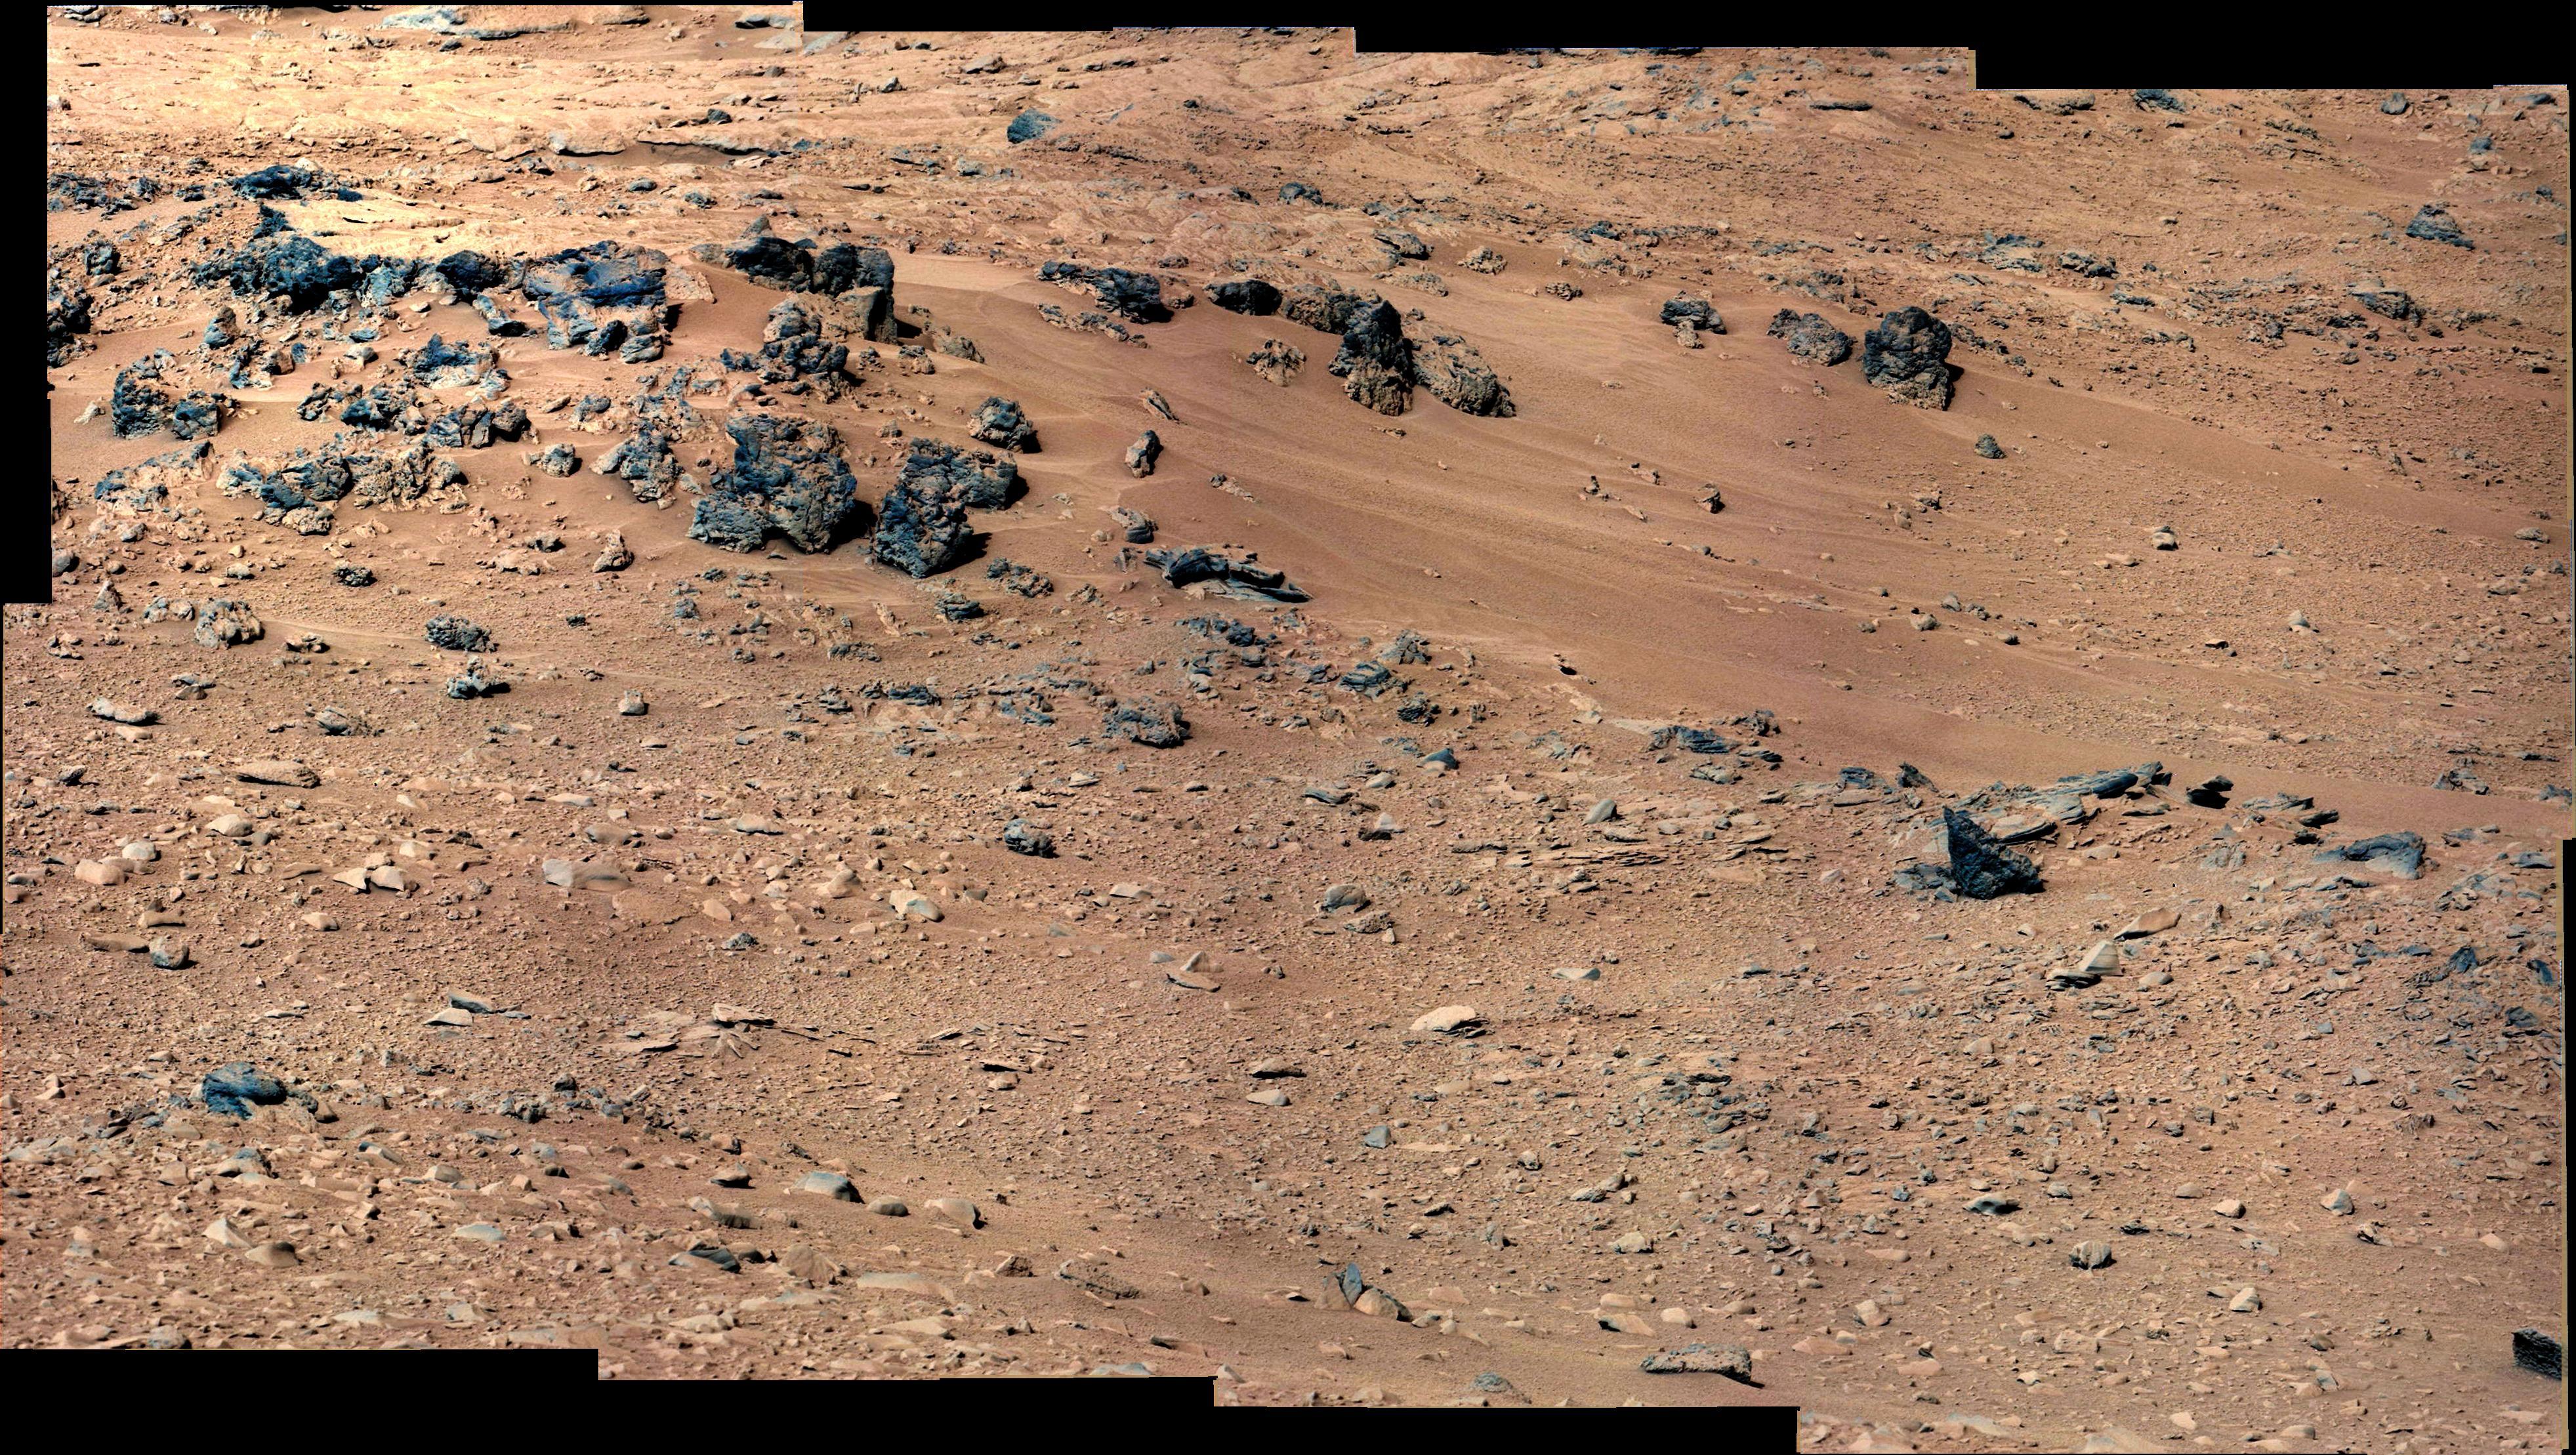 Mars-Lemming